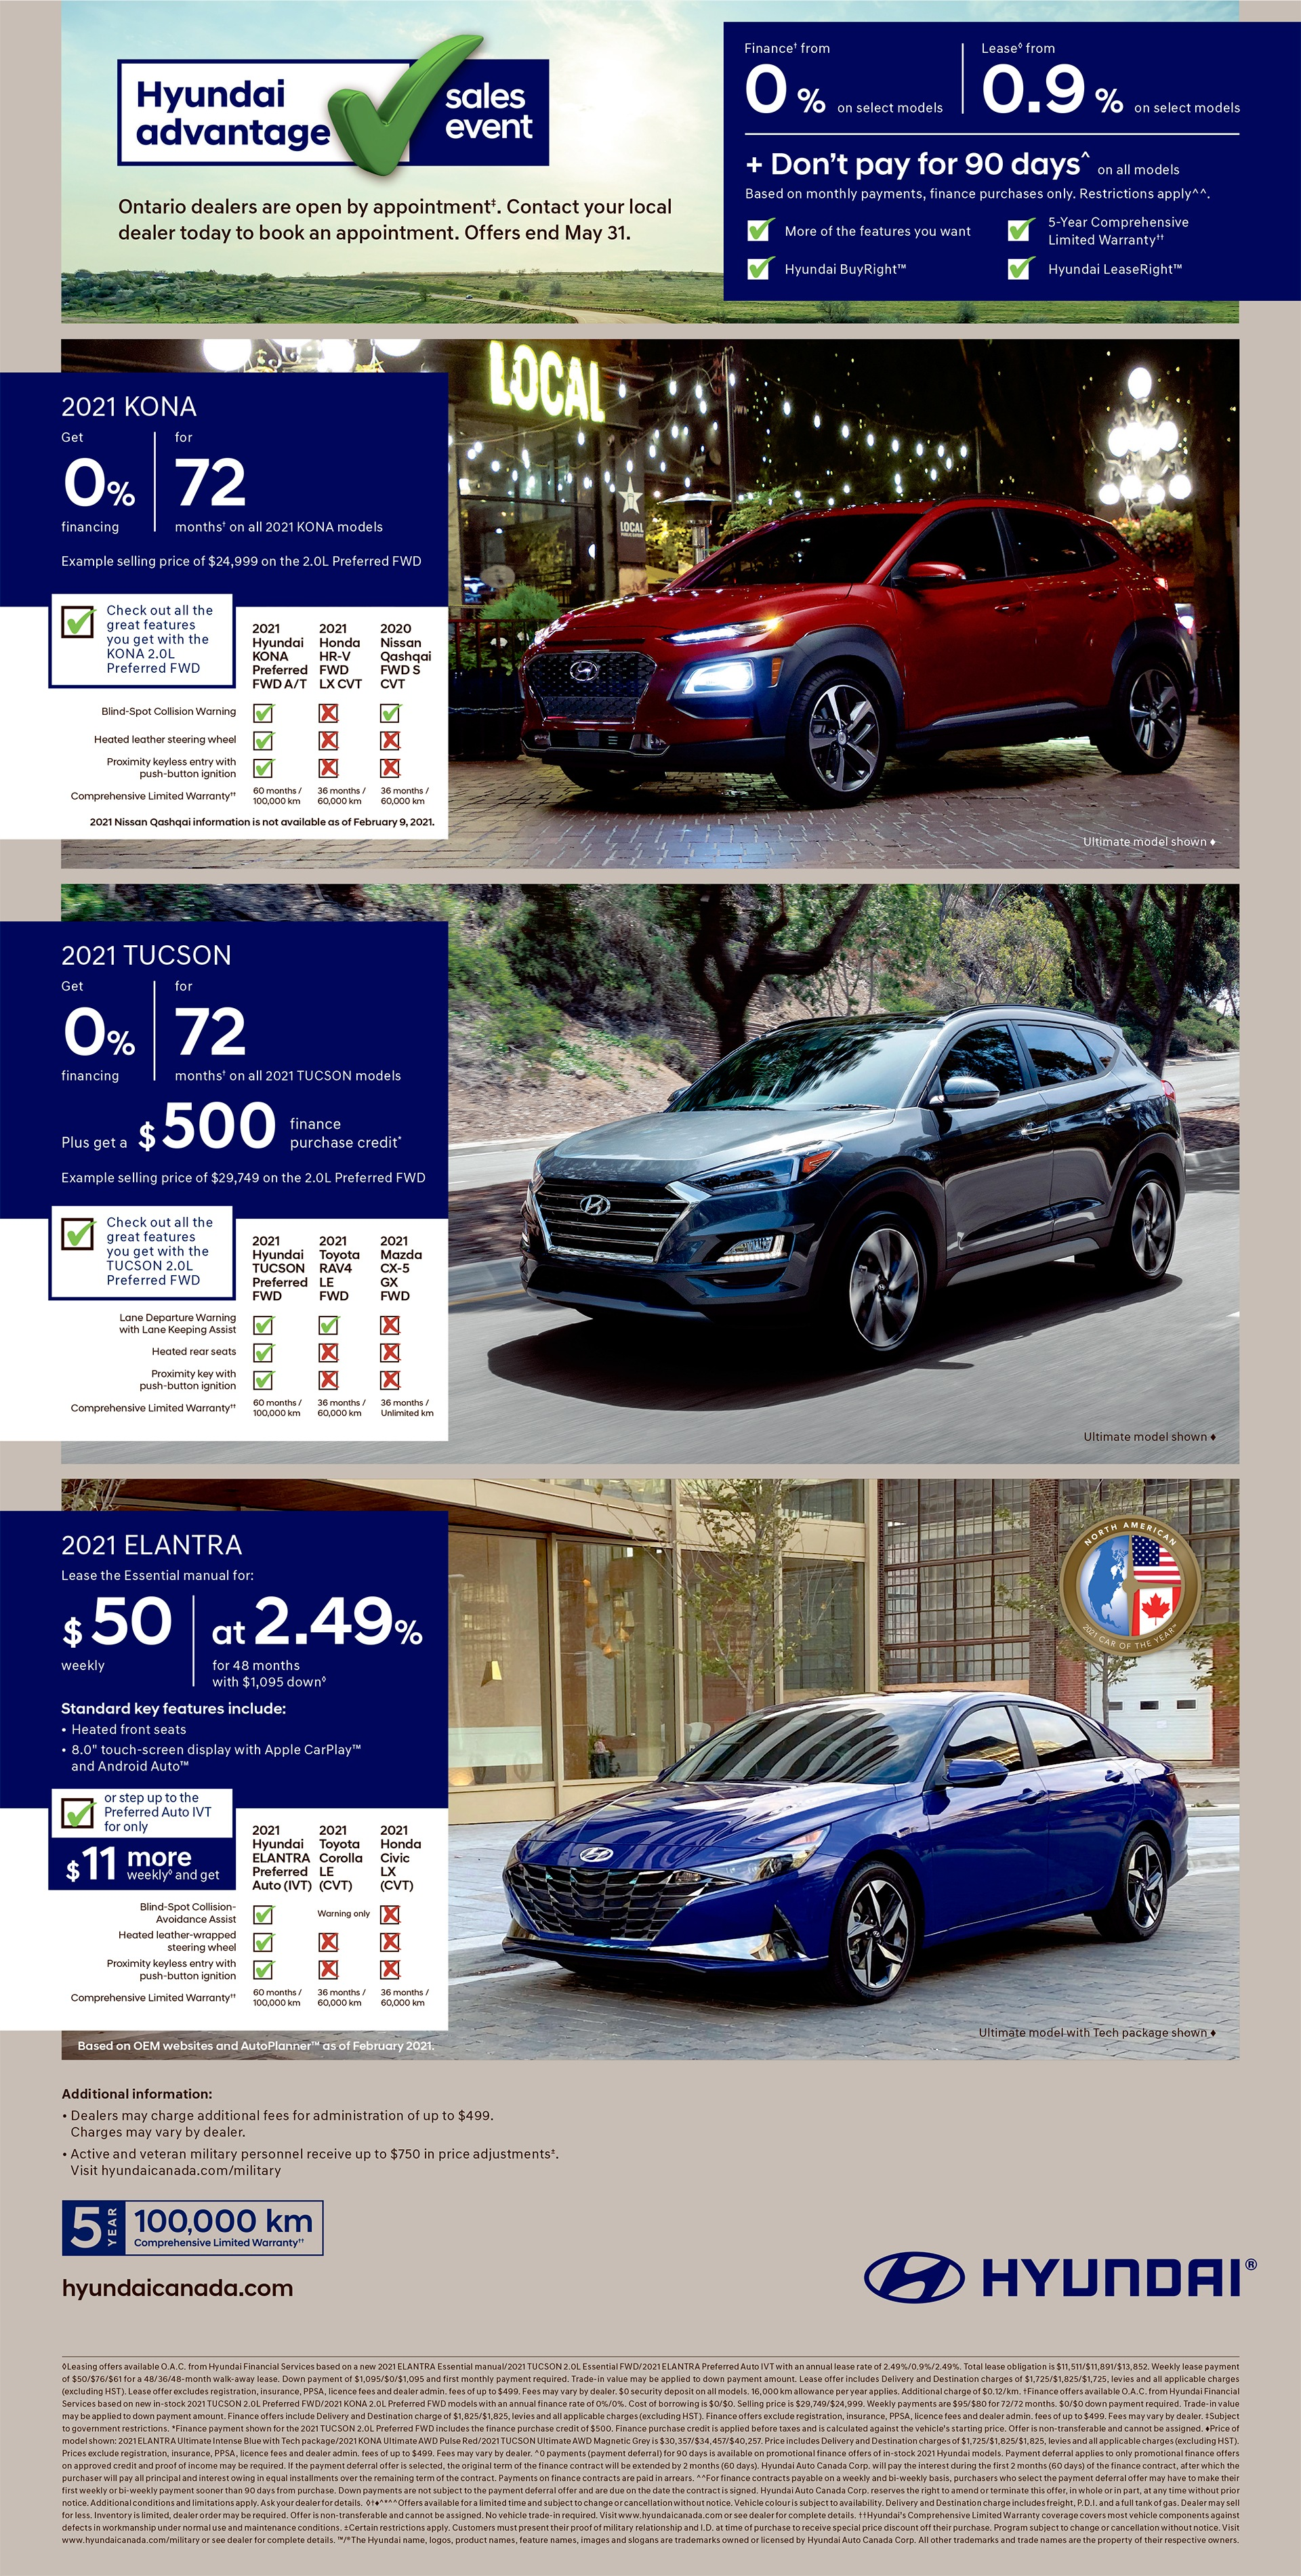 Hyundai Adavantage Sale Event